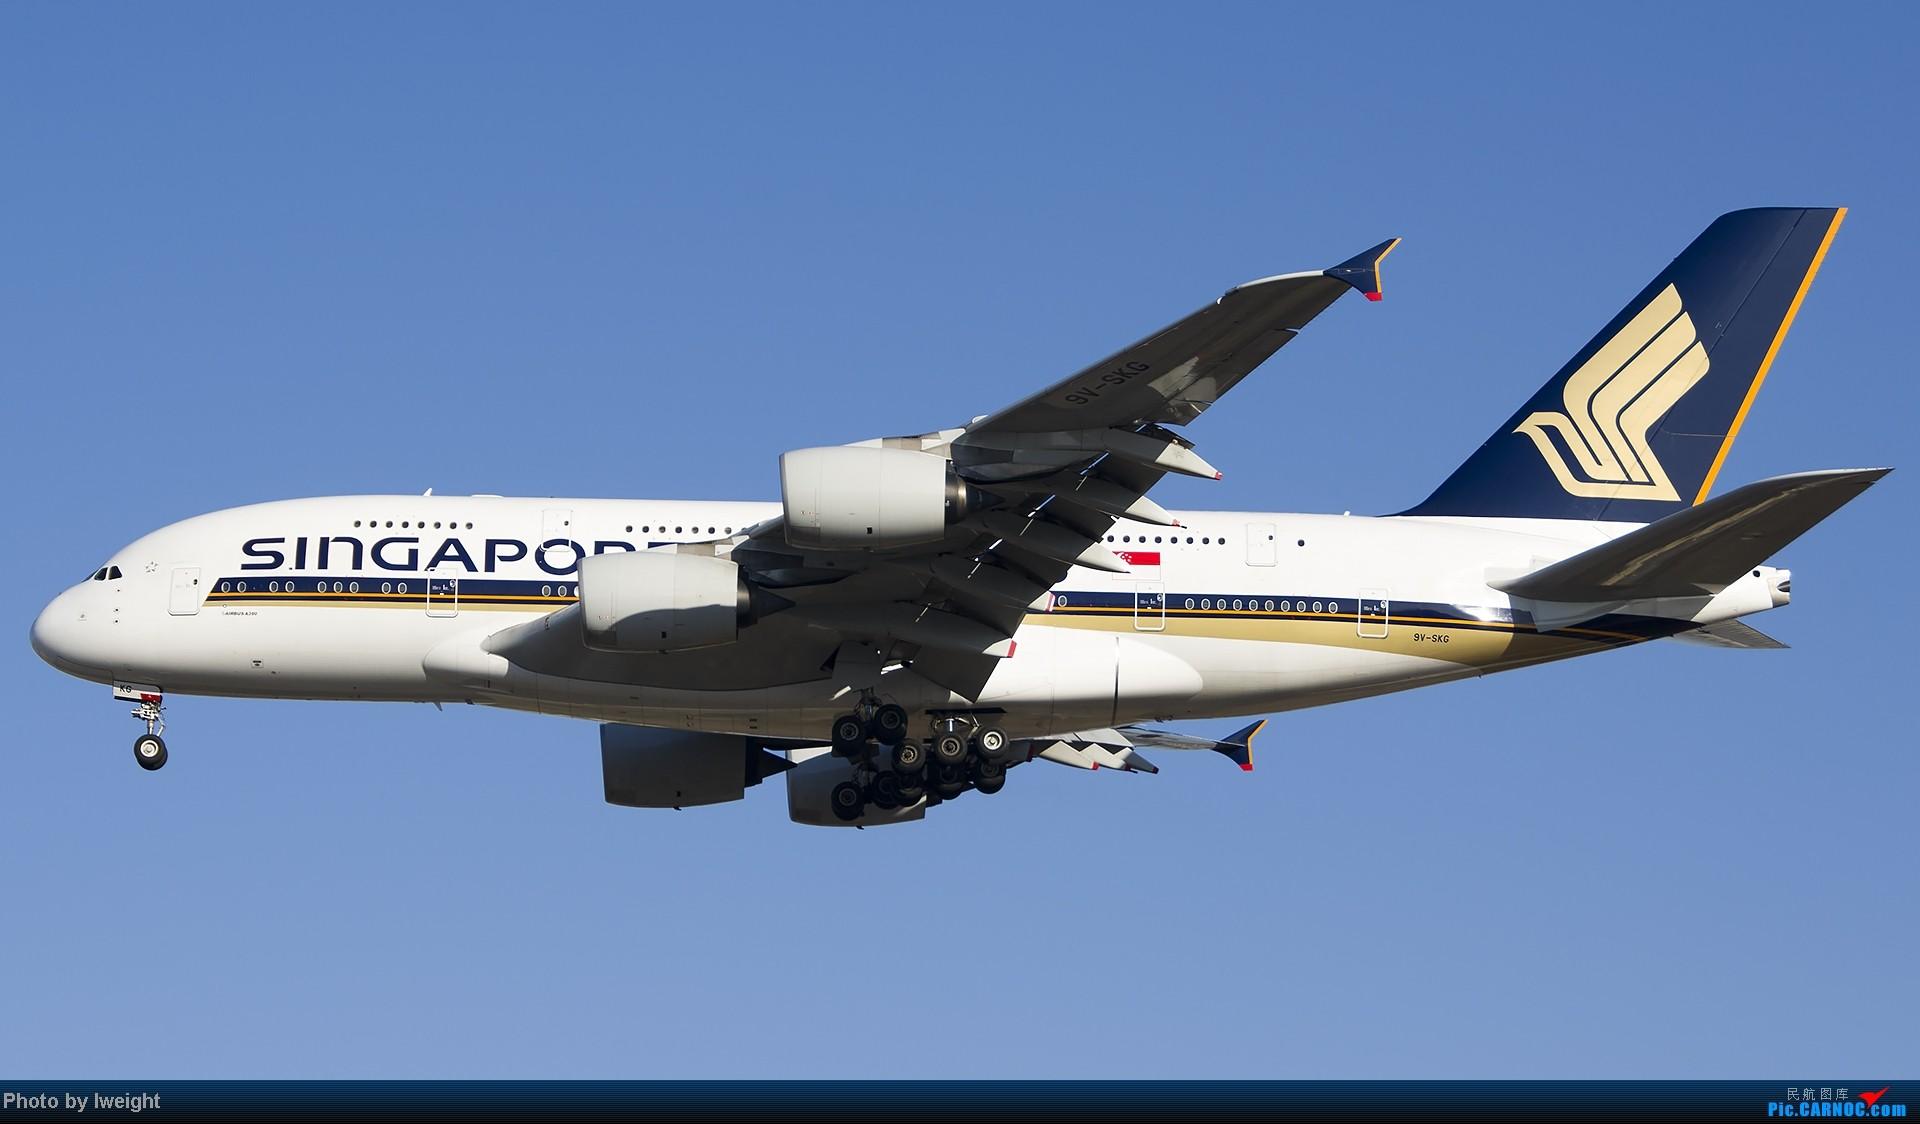 Re:[原创]抓住APEC蓝的尾巴,再拍上一组 AIRBUS A380-800 9V-SKG 中国北京首都机场